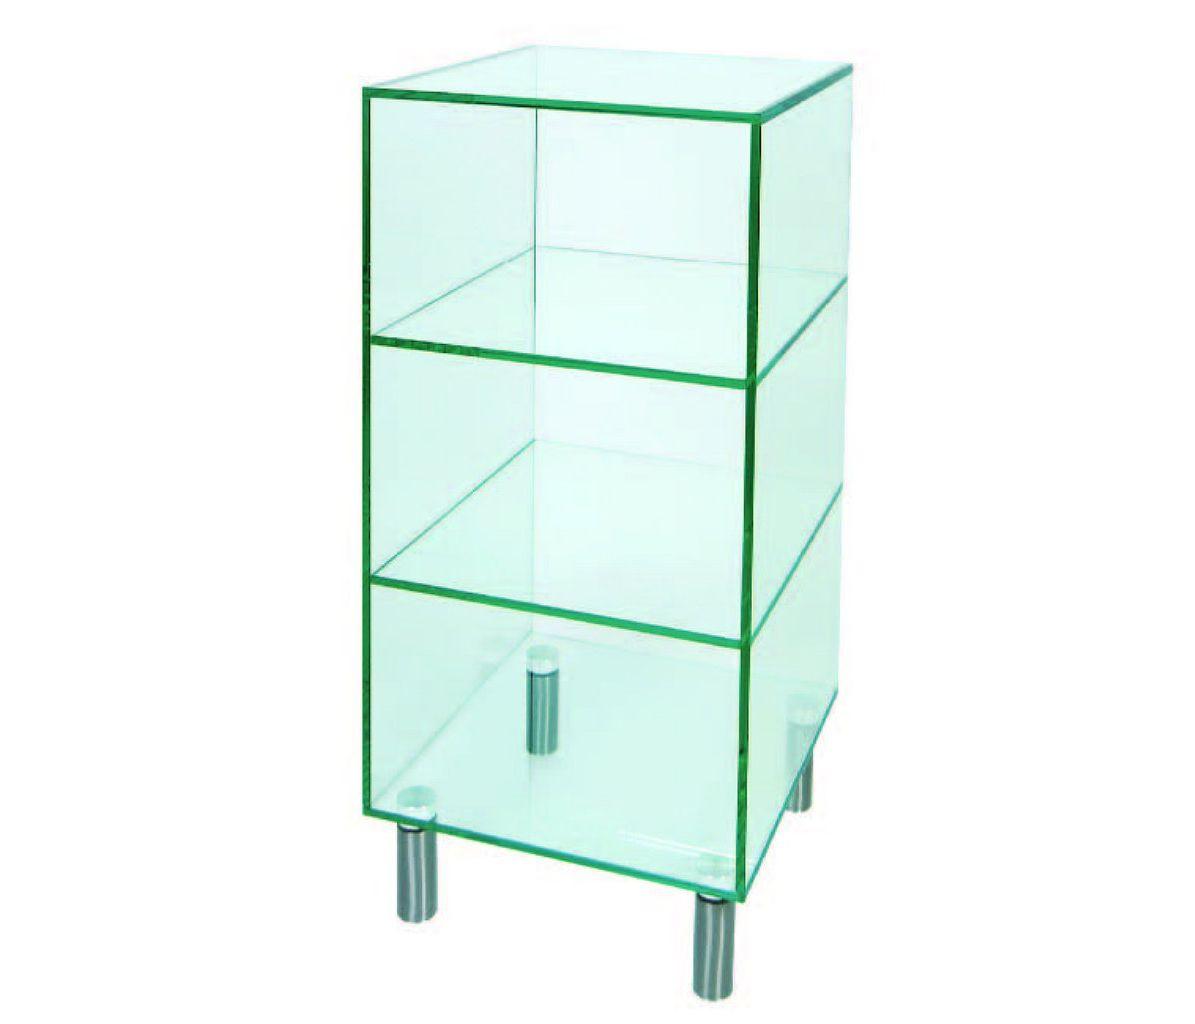 green apple glass glass shelf unit small. Black Bedroom Furniture Sets. Home Design Ideas